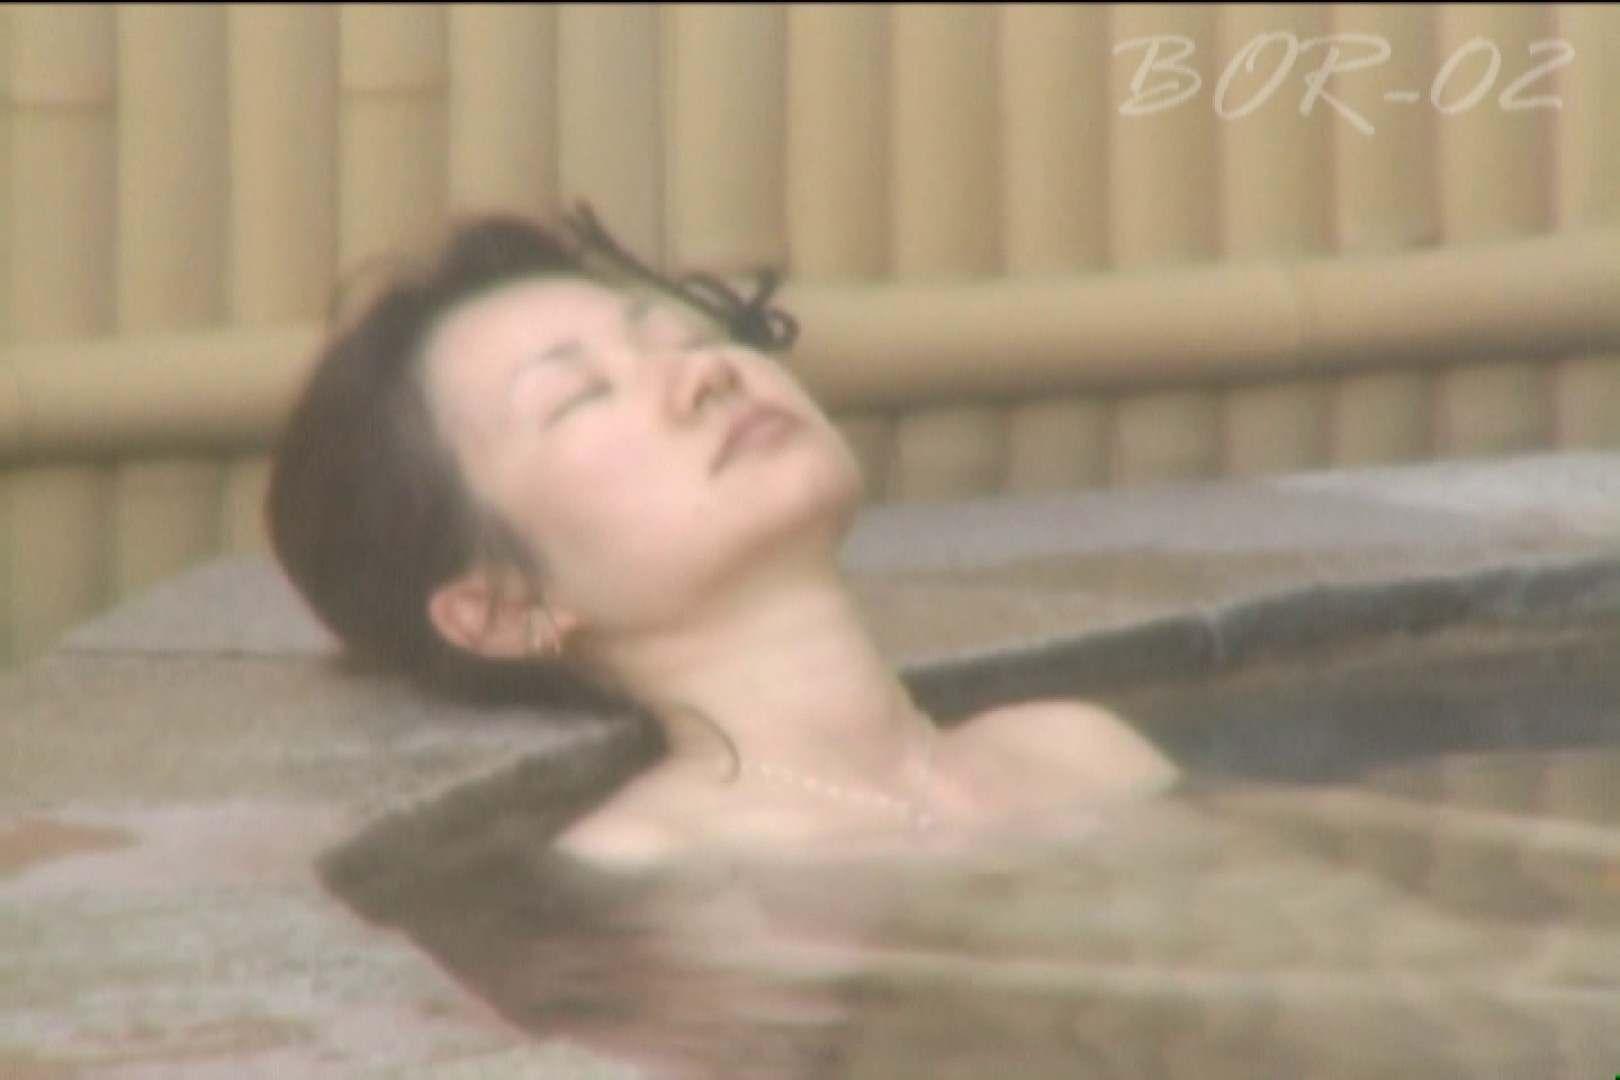 Aquaな露天風呂Vol.477 盗撮シリーズ | 露天風呂編  104PIX 61